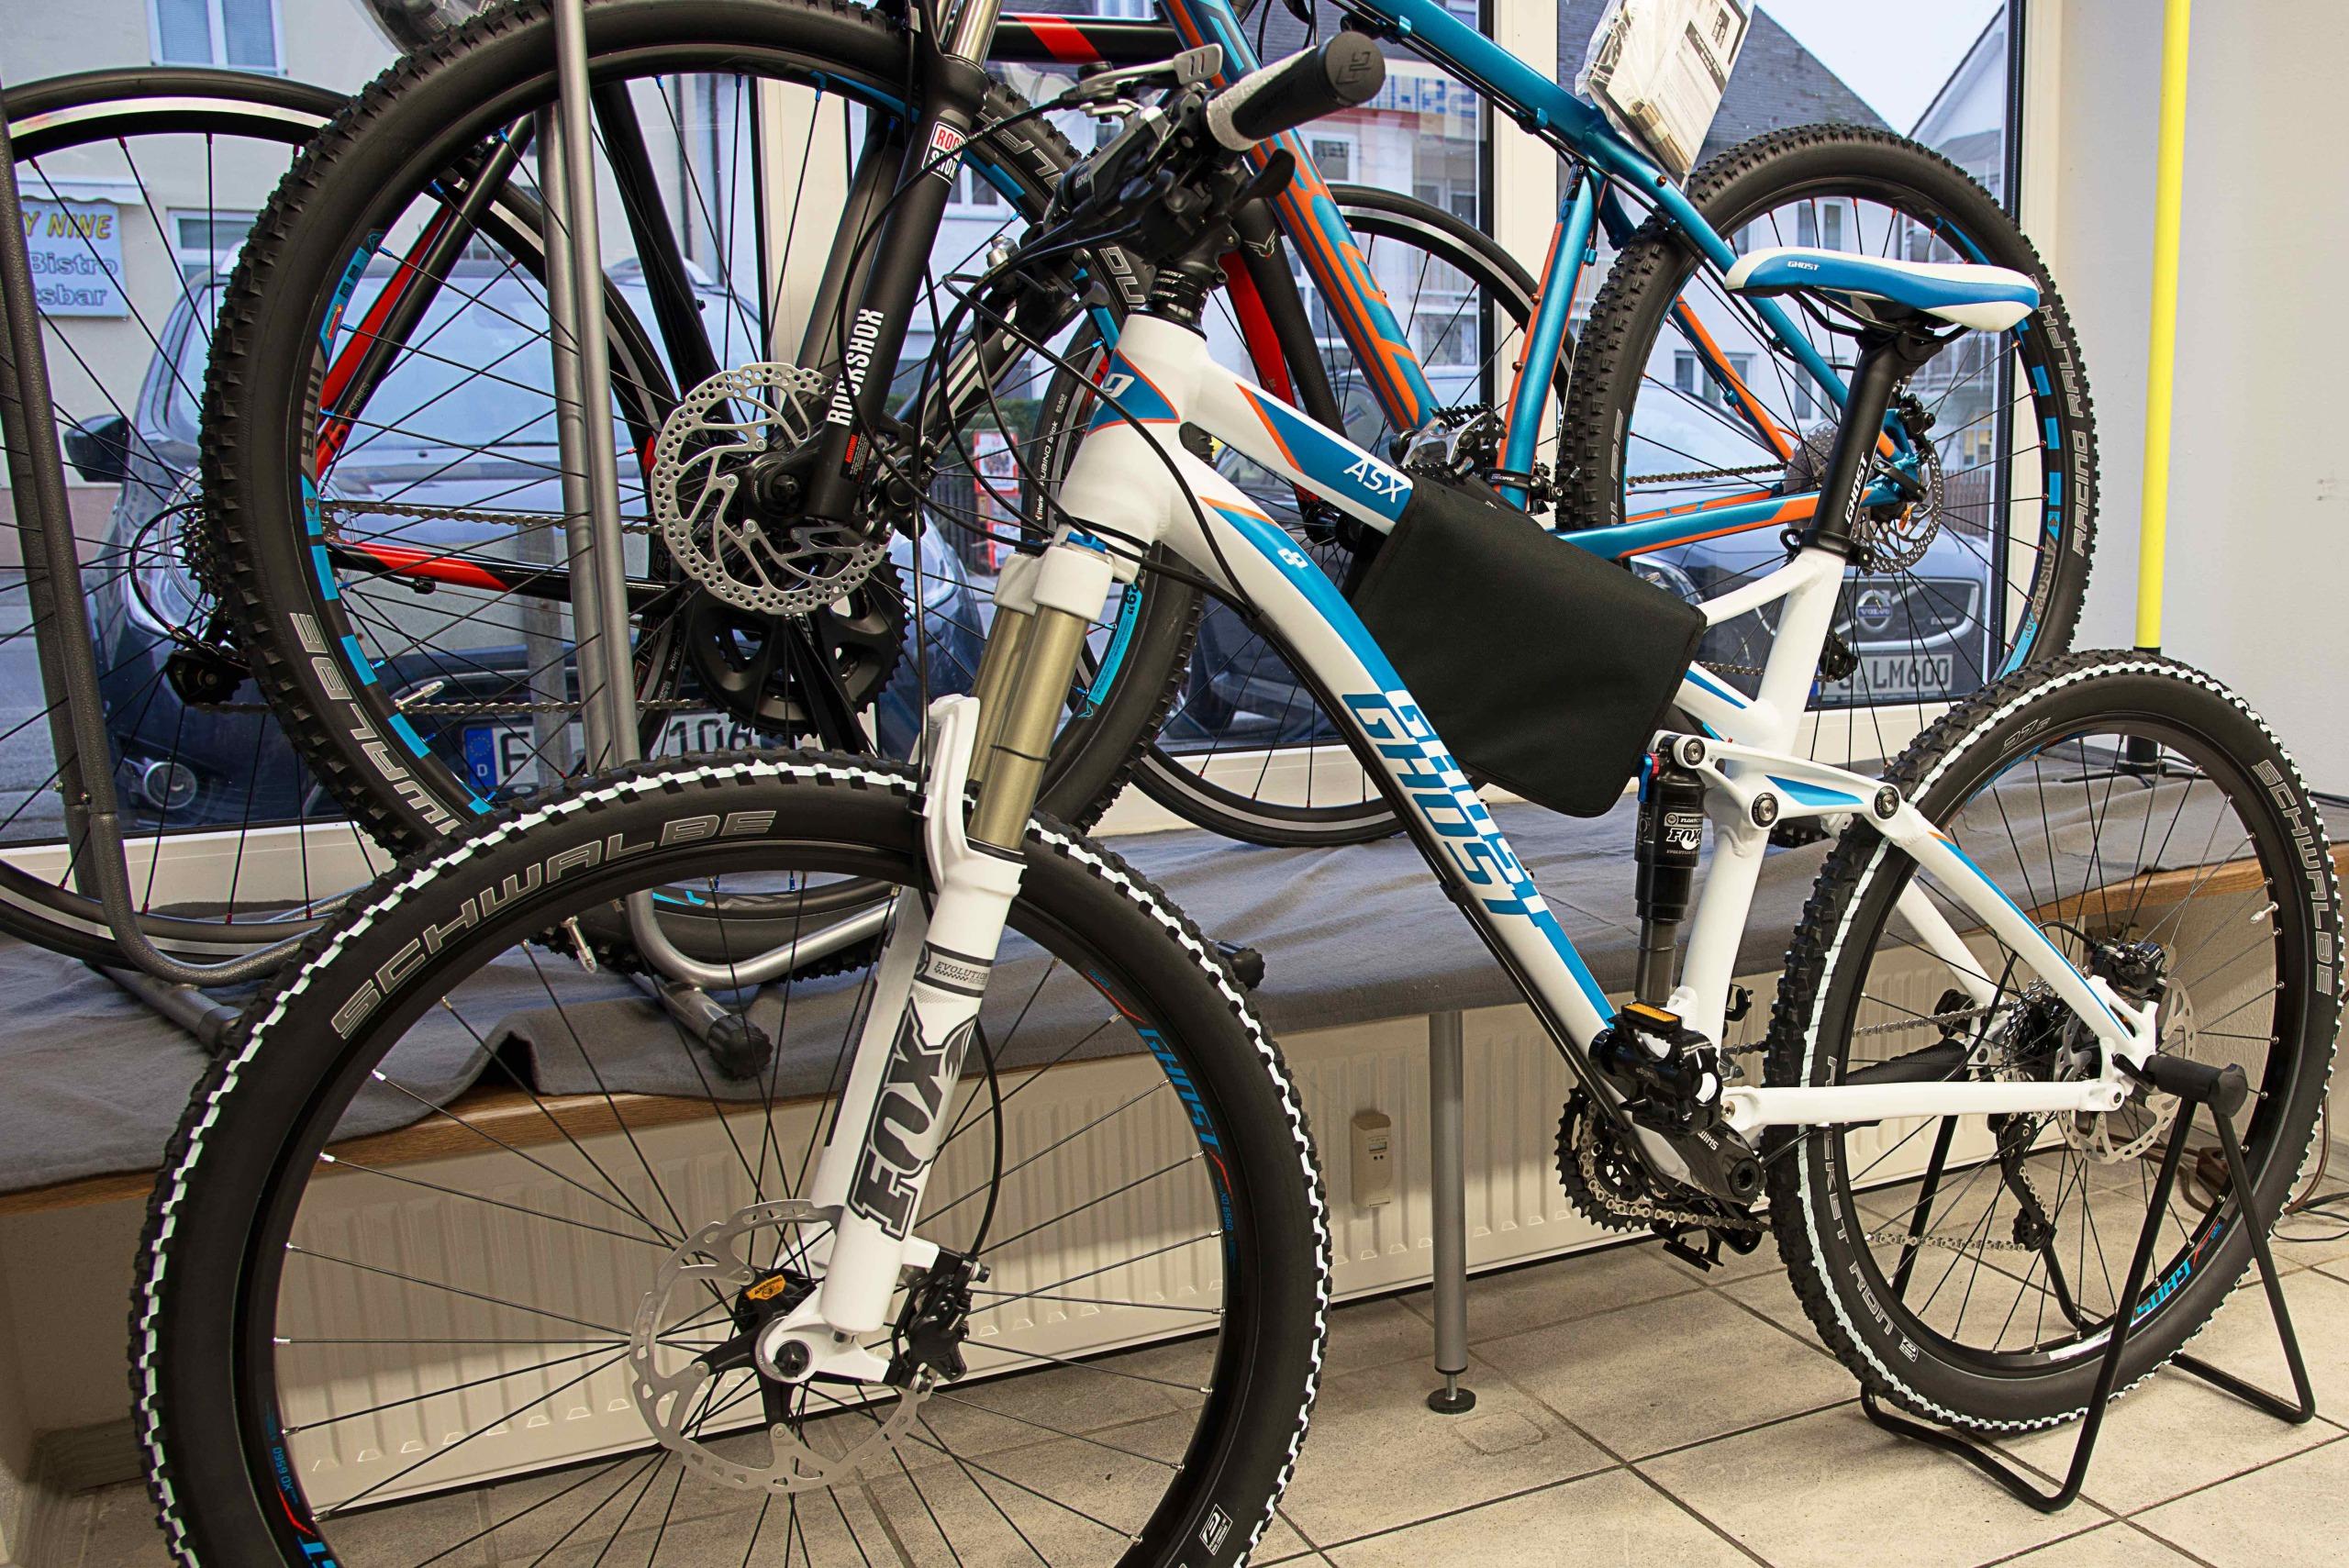 Bikestation Freising _ GHOST Spitzenbike